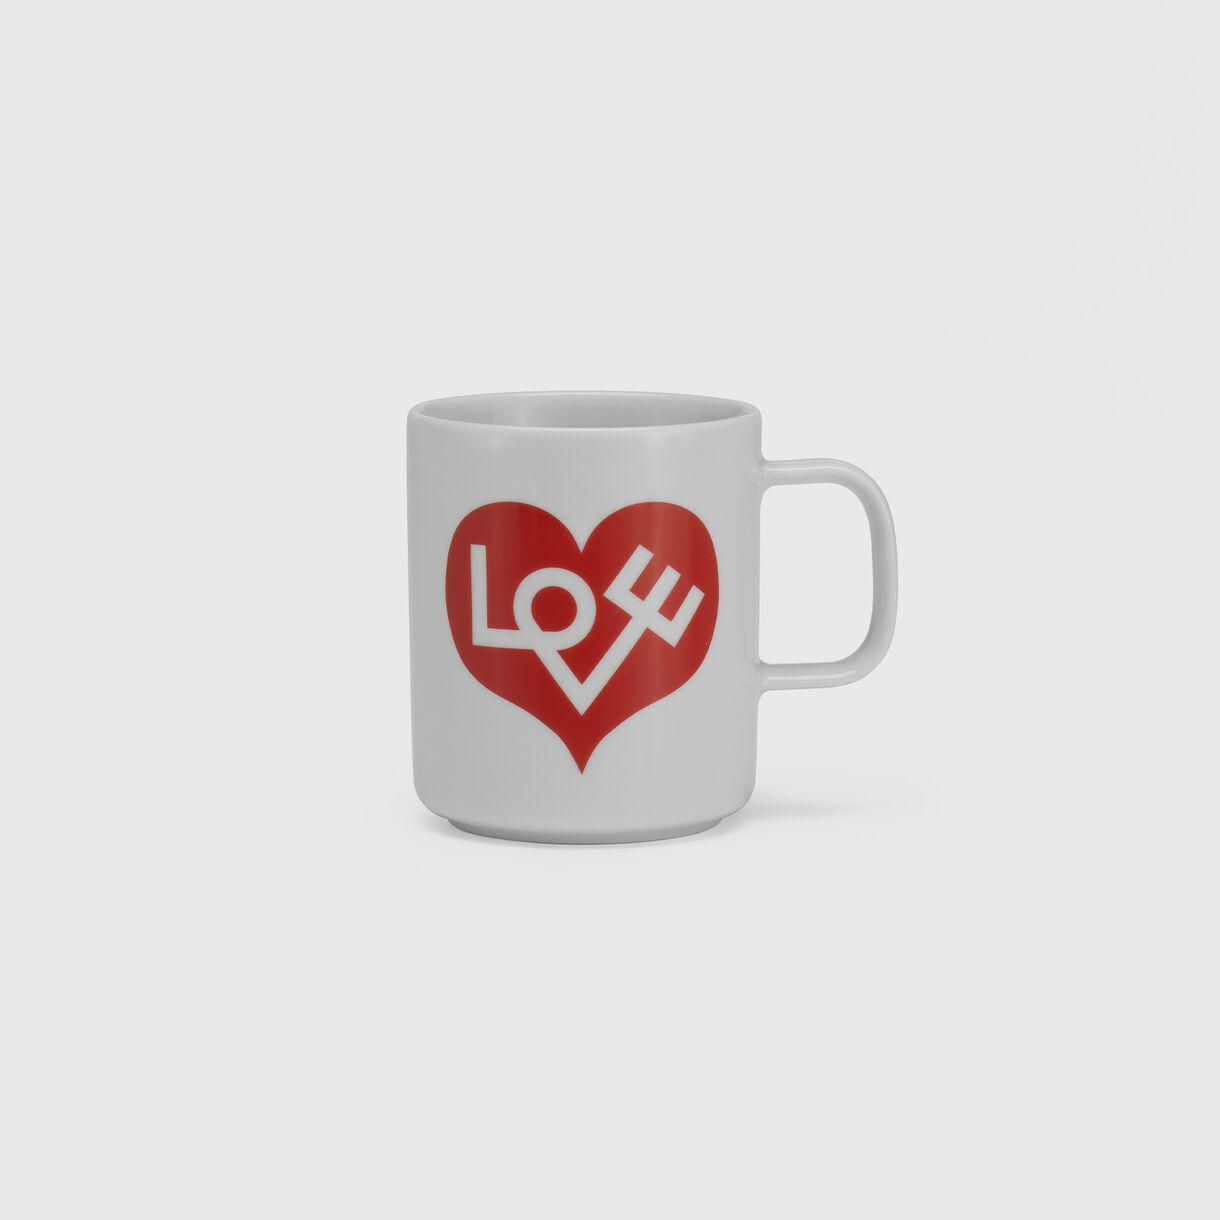 Girard Coffee Mug, Red Love Heart